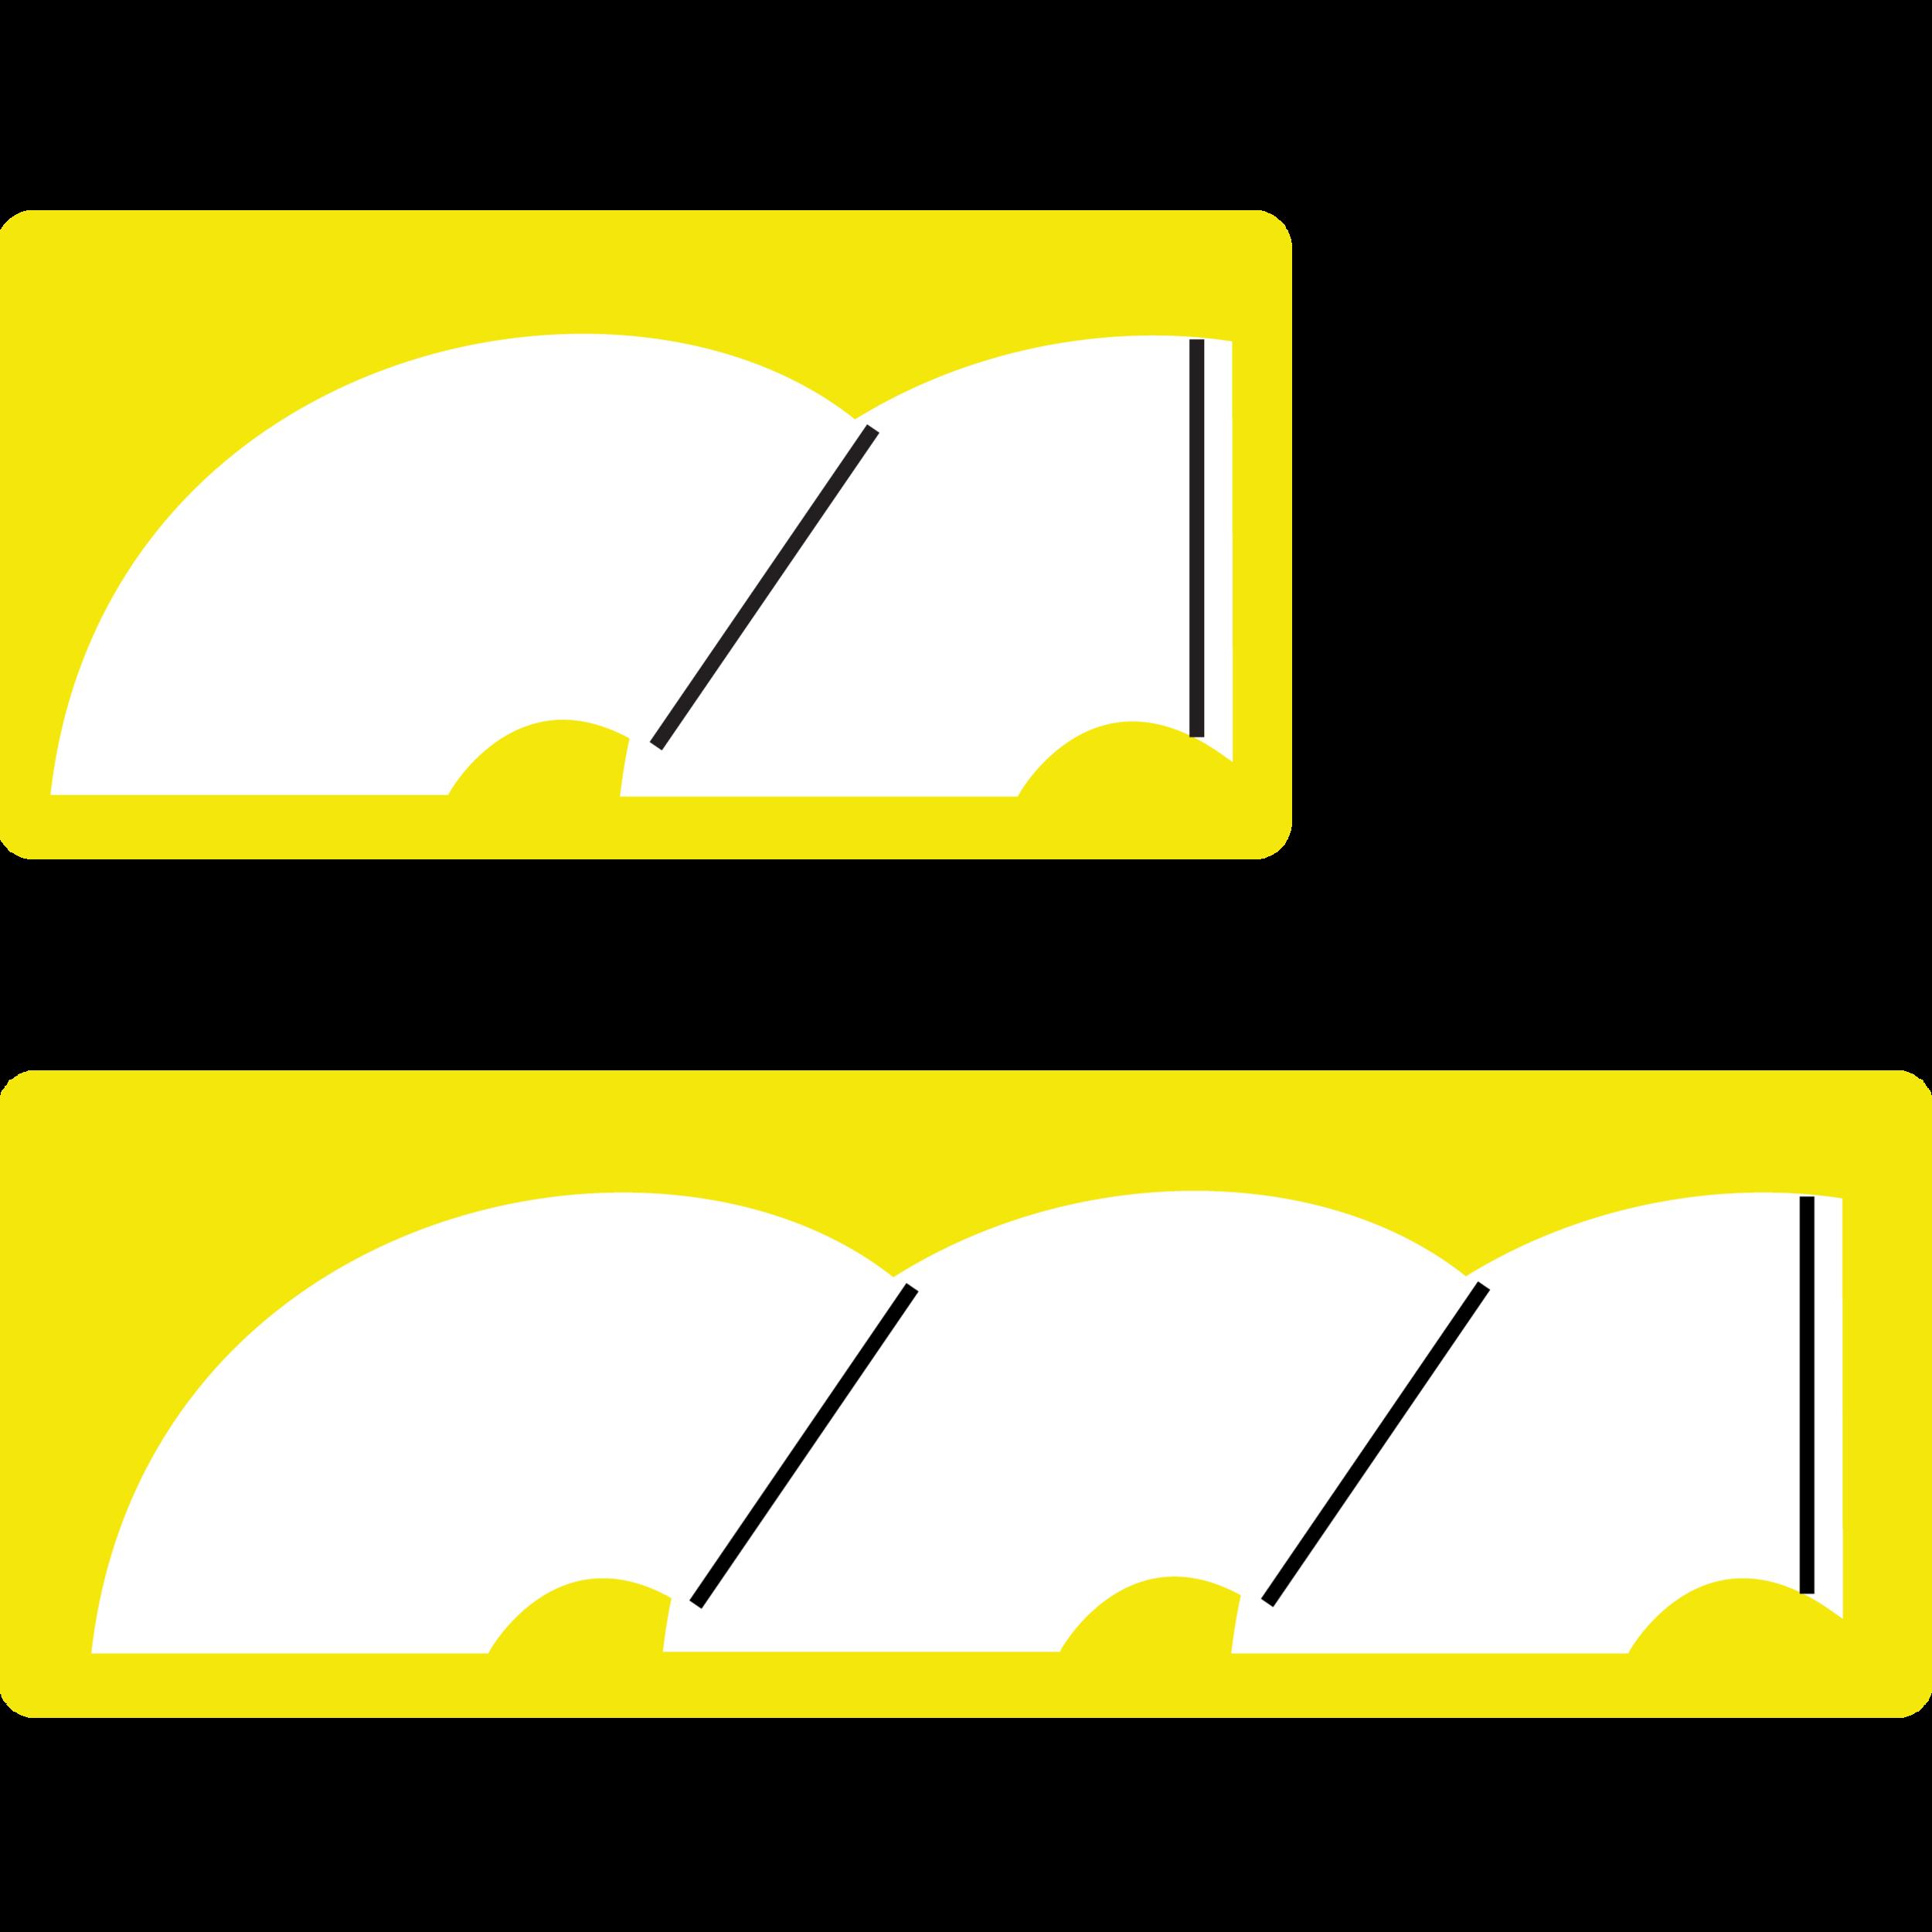 Double Pivot Radial and Triple Pivot Radial